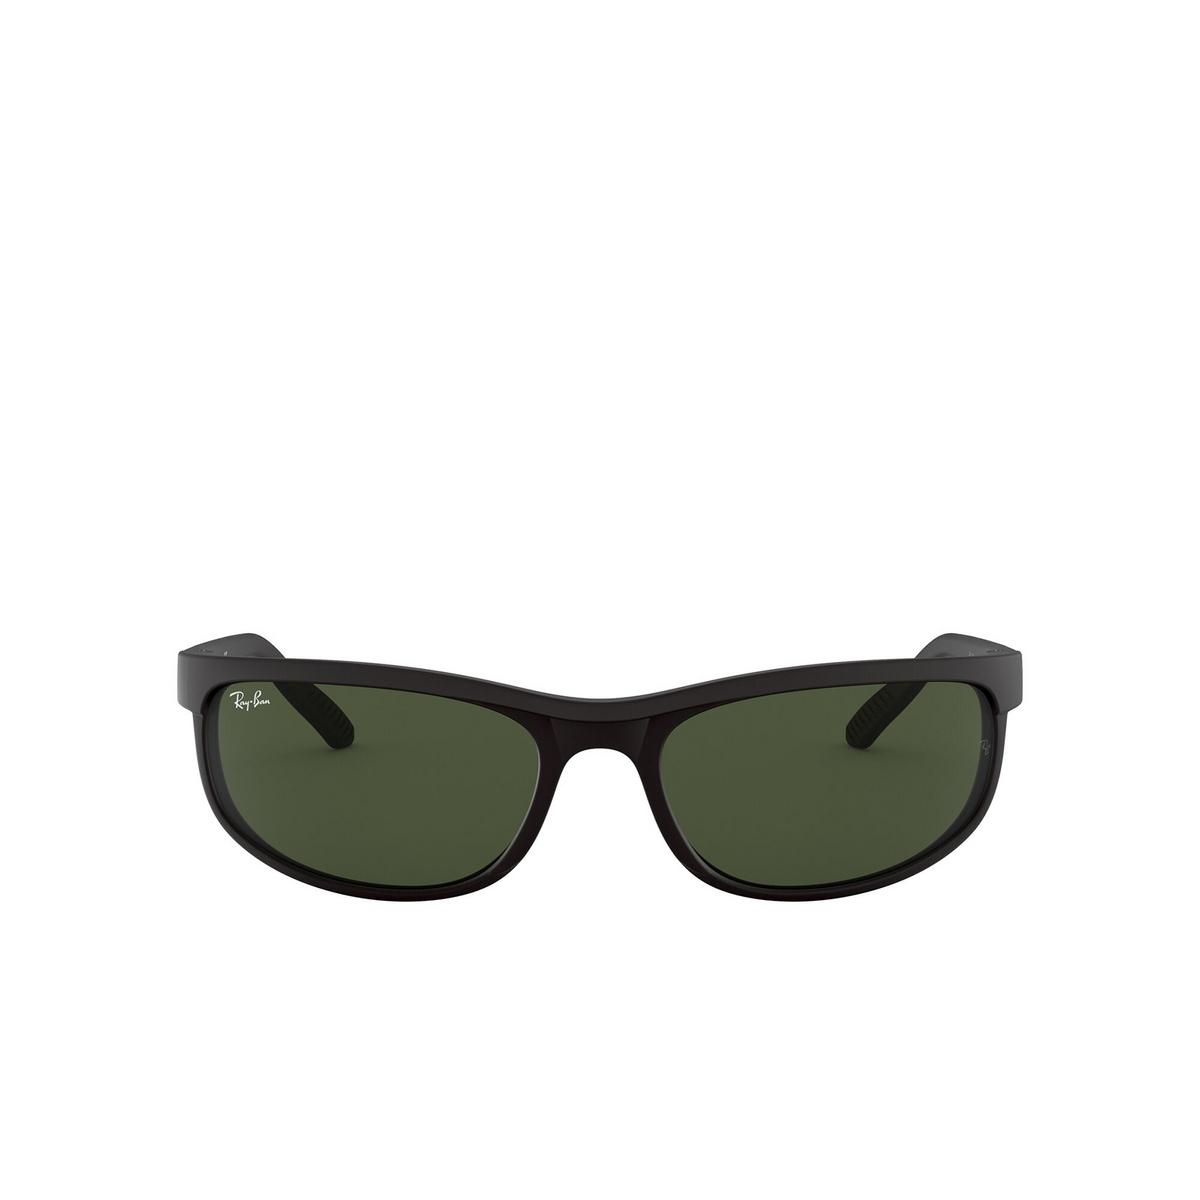 Ray-Ban® Rectangle Sunglasses: Predator 2 RB2027 color Black W1847 - 1/3.